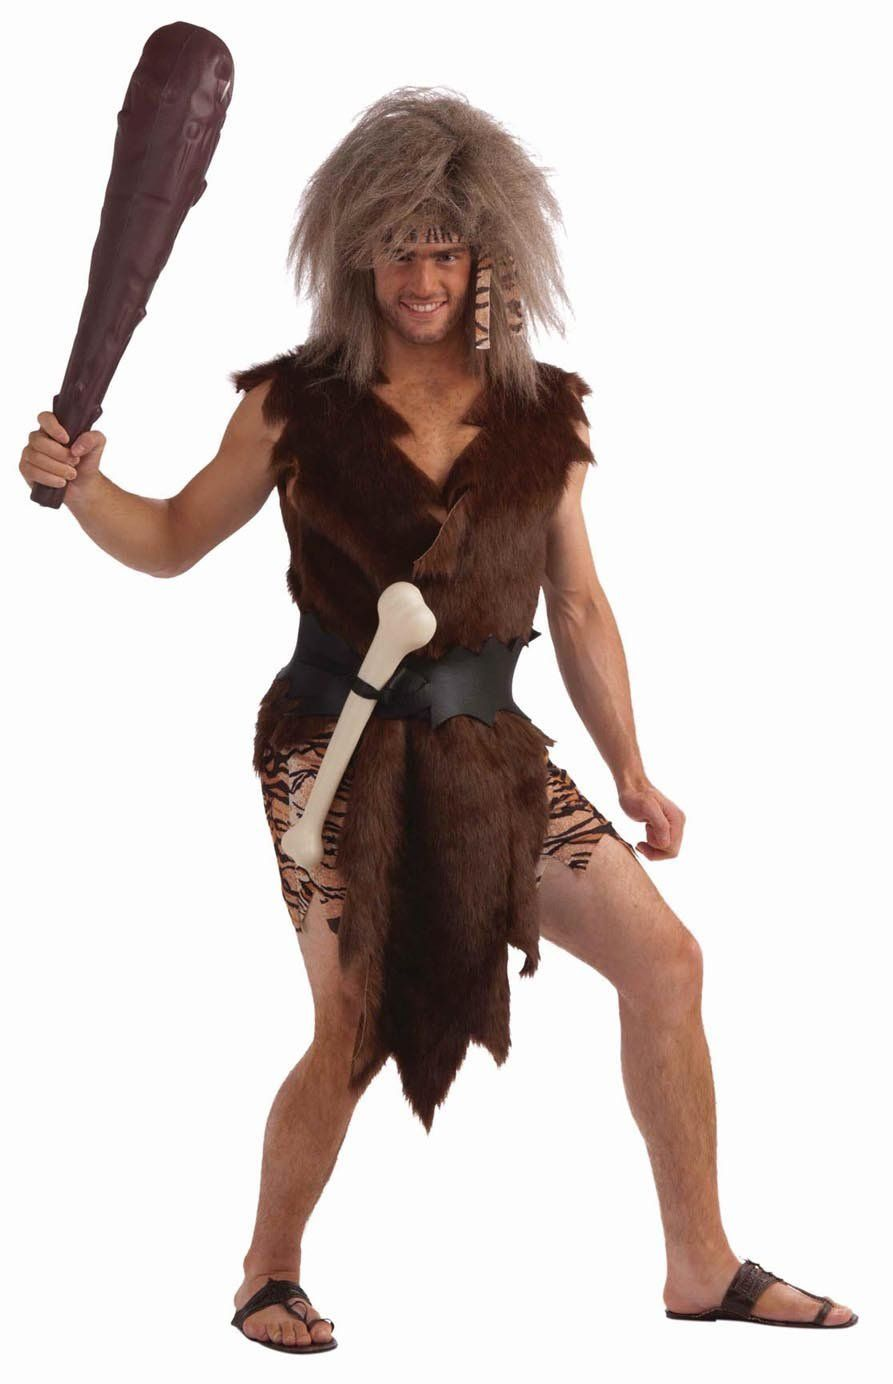 Adults Caveman Halloween Costumes for Everyone | Adults Halloween ...